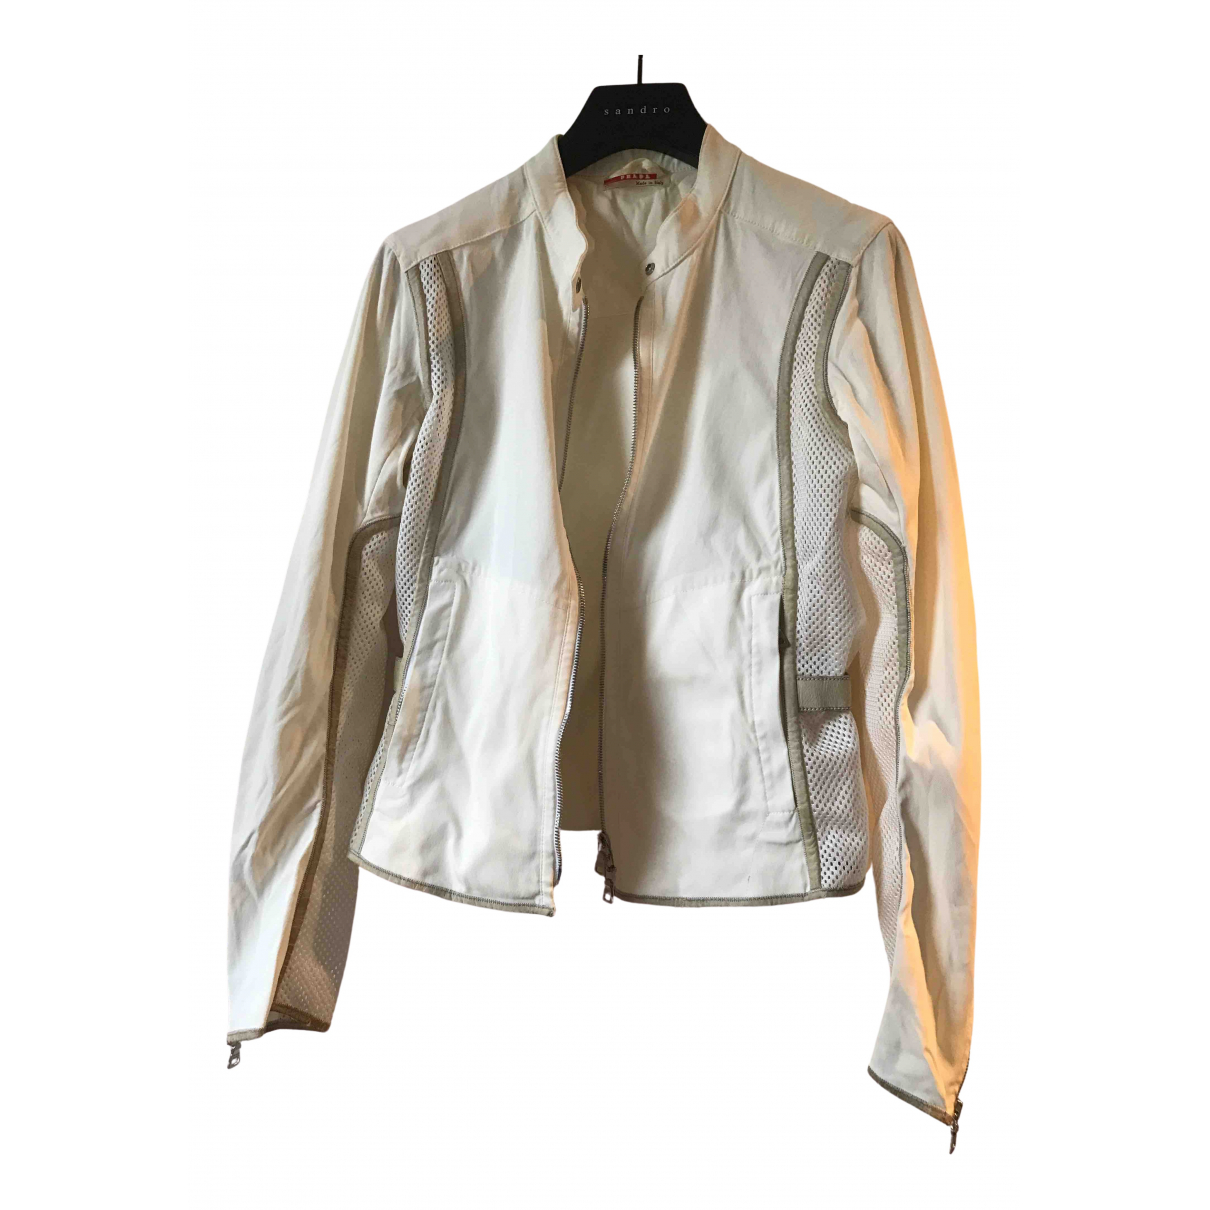 Prada \N White jacket for Women M International